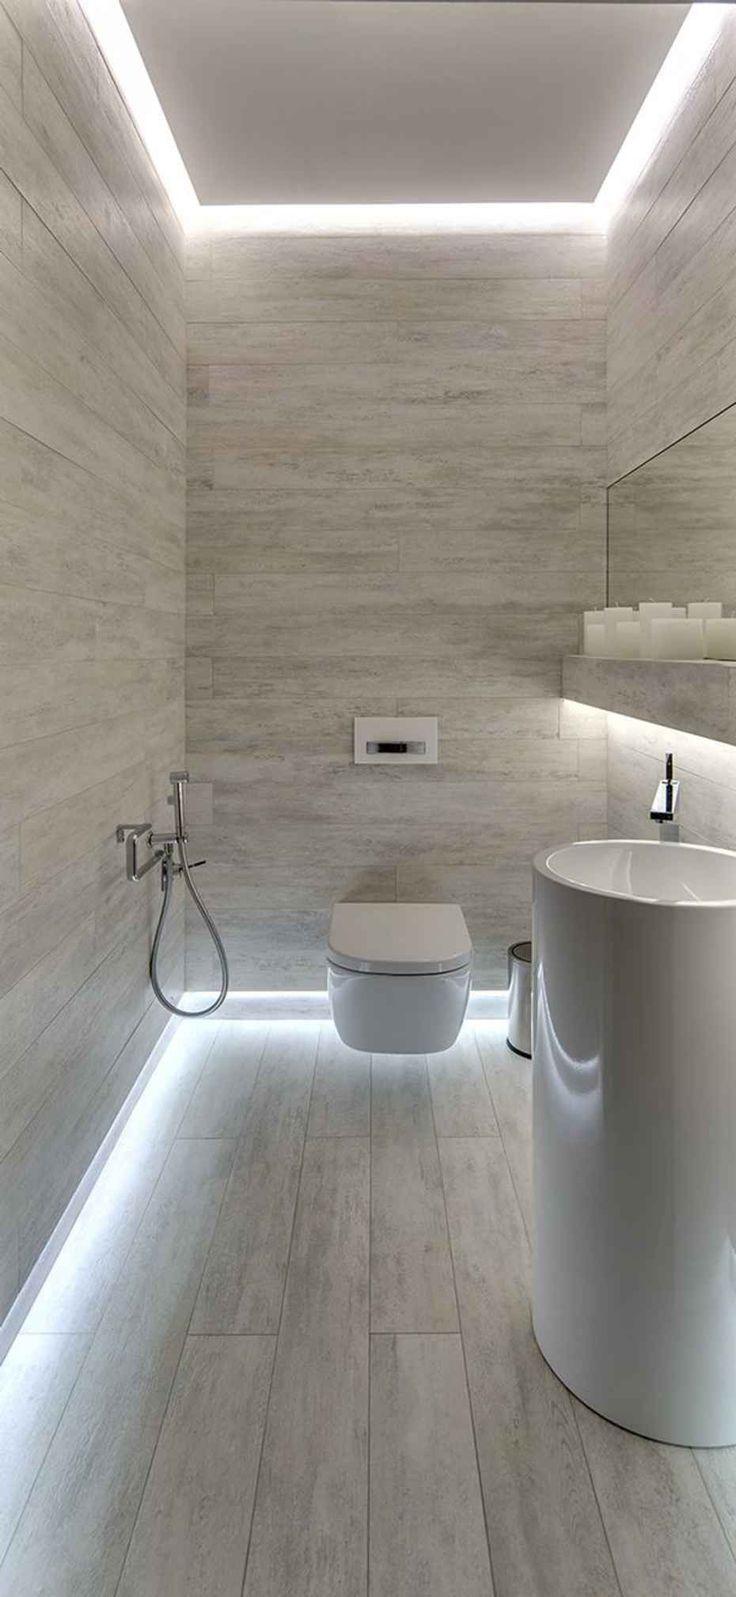 54 best huis wc images on pinterest bathroom ideas room and live 30 examples of minimal interior design 13 modern bathroomsbeautiful bathroomssmall